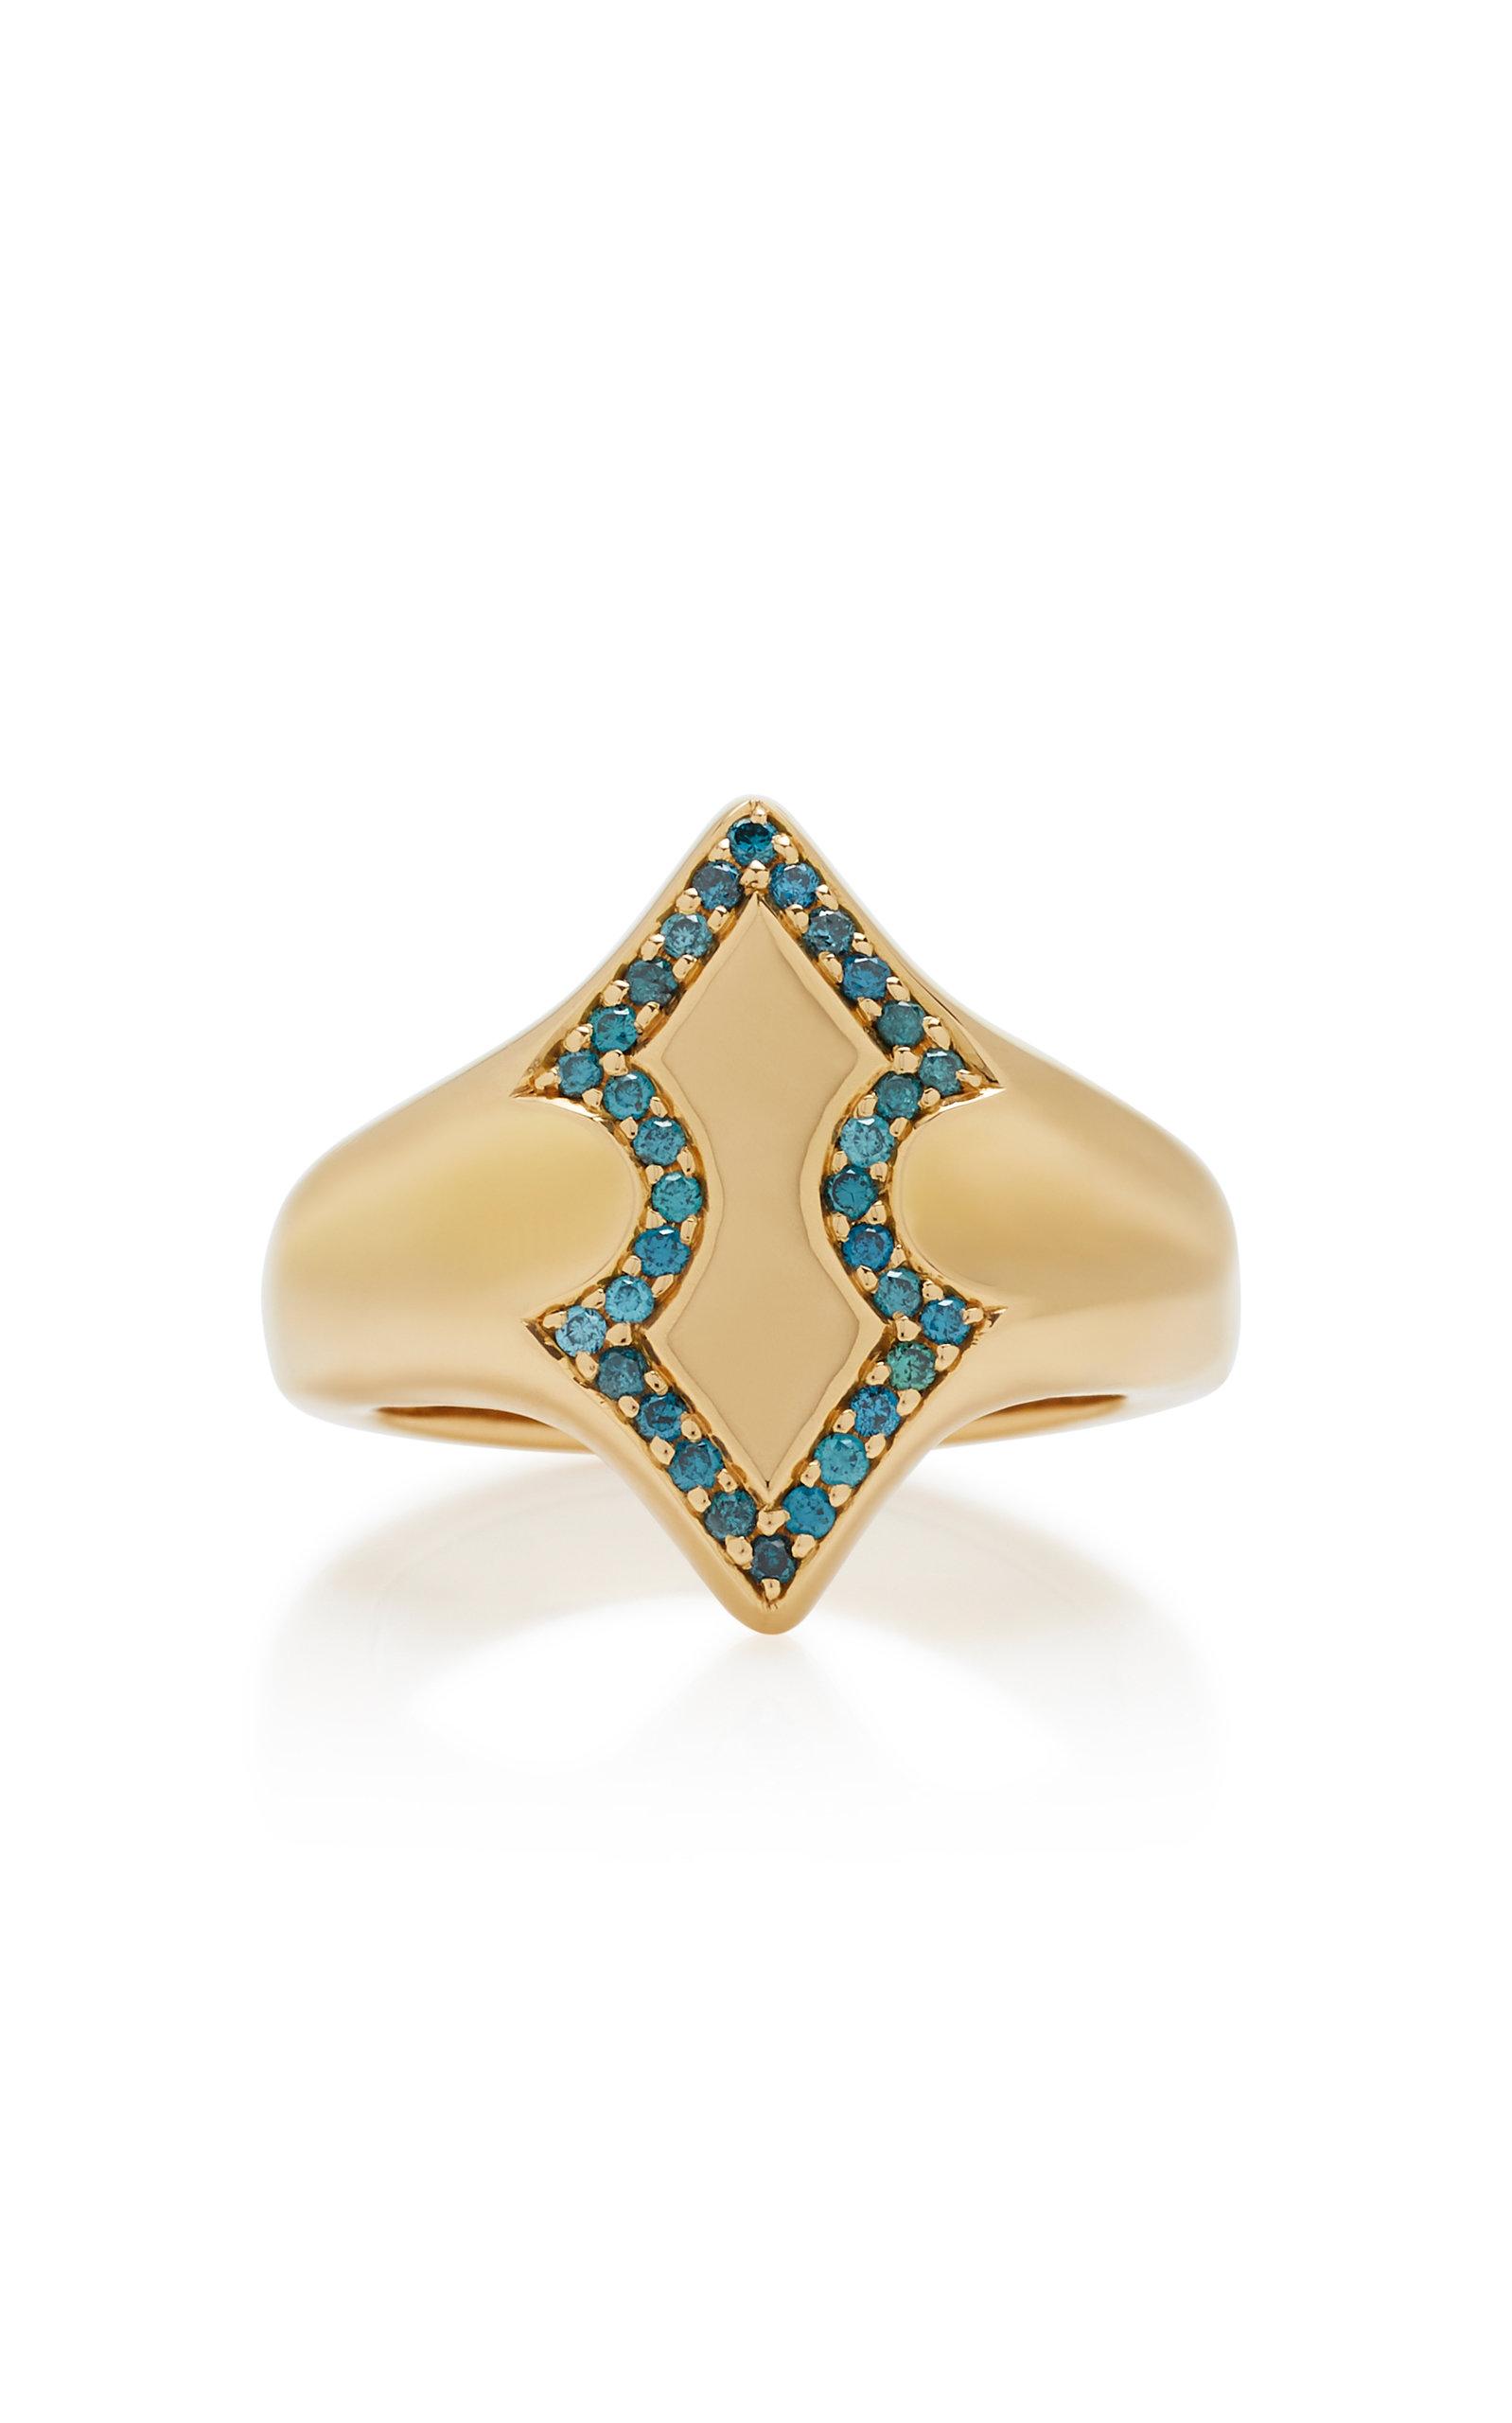 ILANA ARIEL Adina 18K Gold Diamond Signet Ring